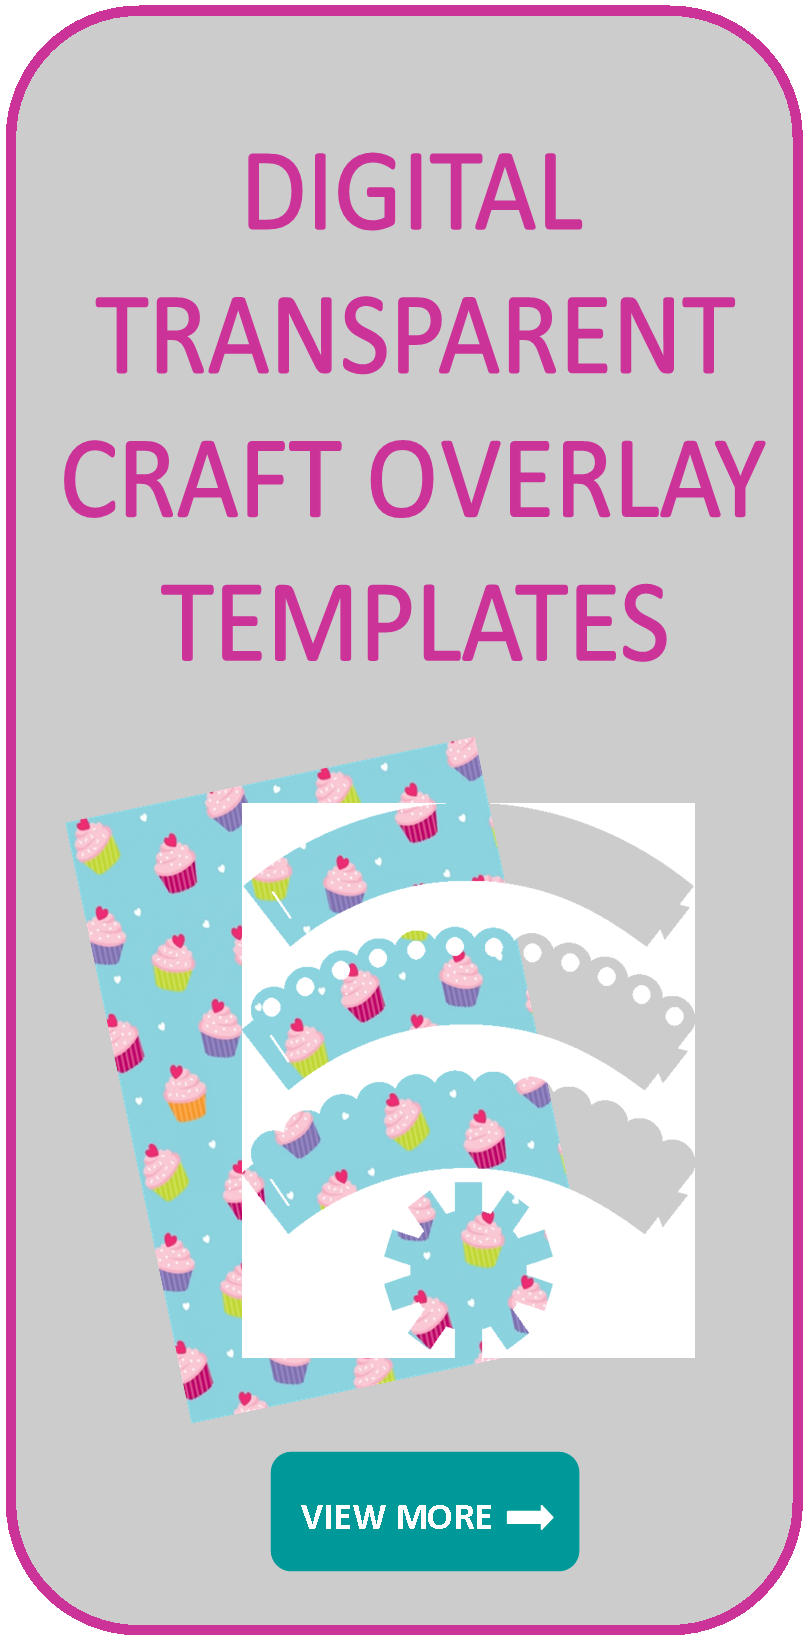 Digital transparent overlay templates